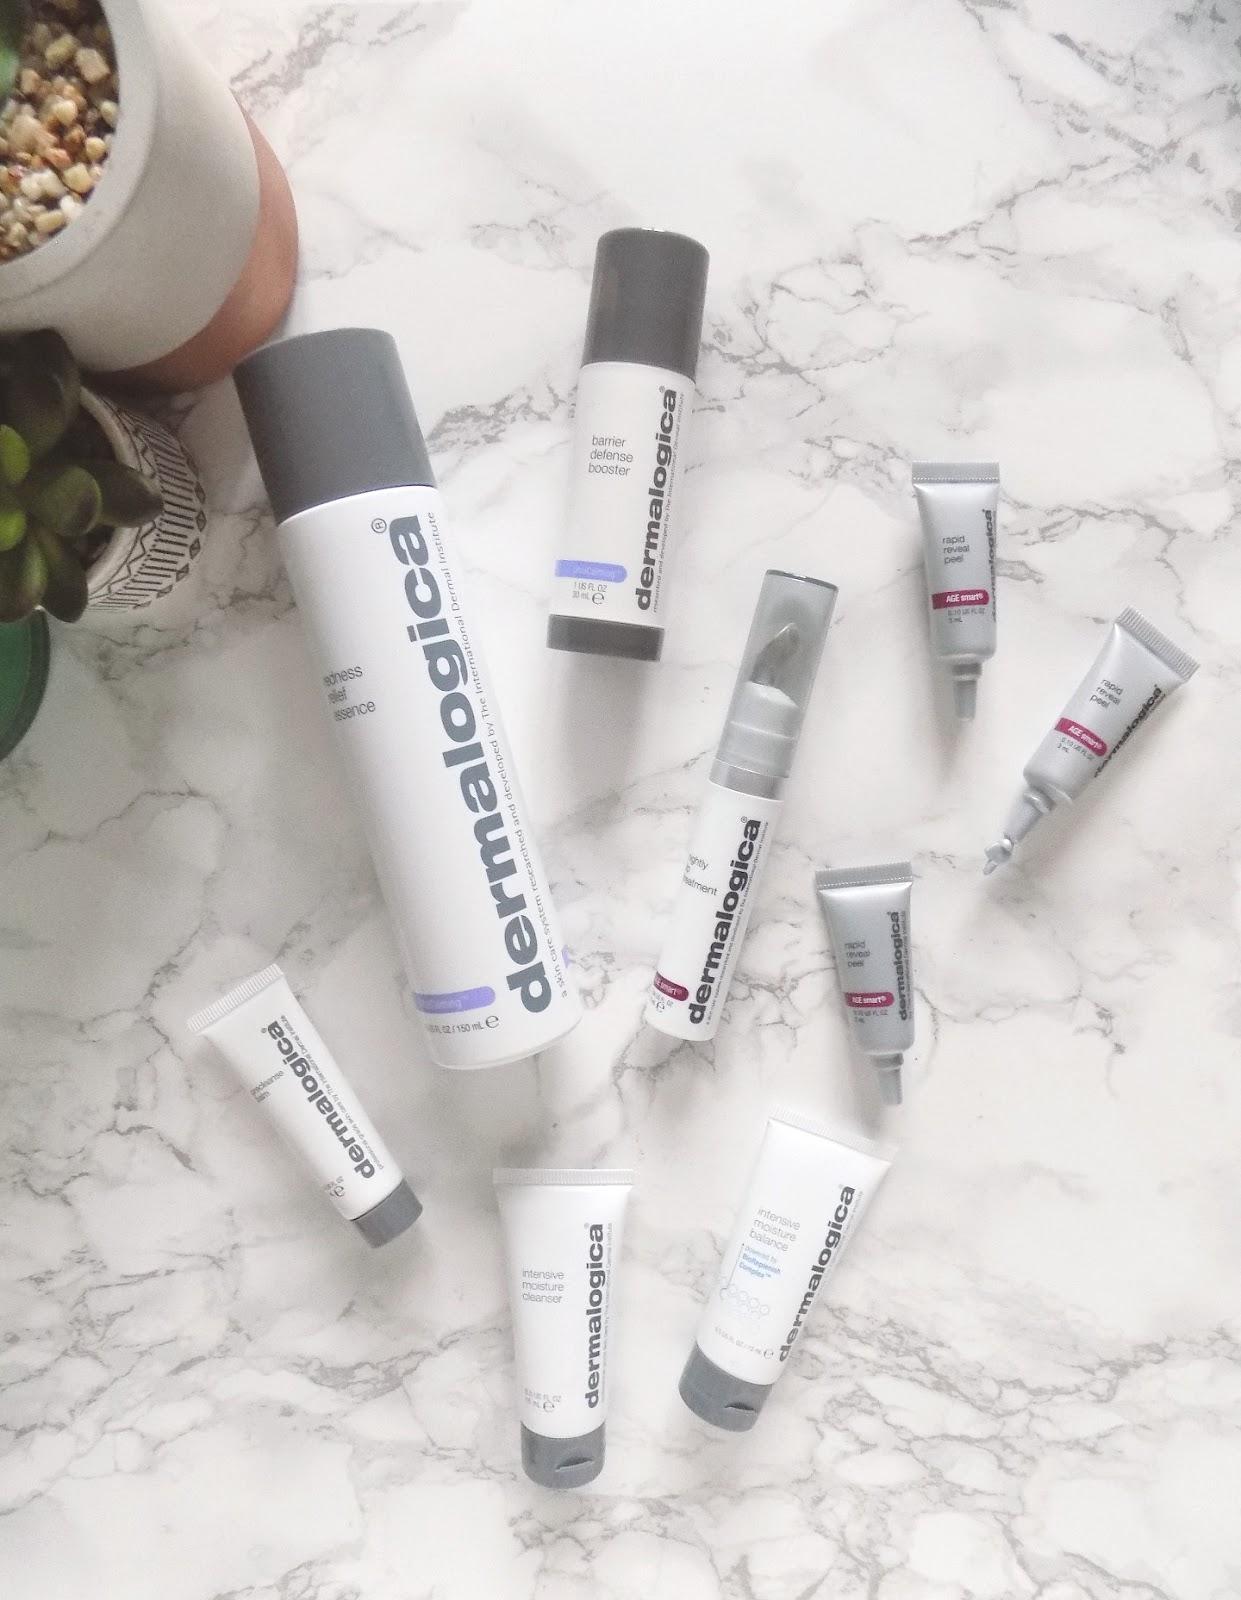 dermalogica winter skin care review